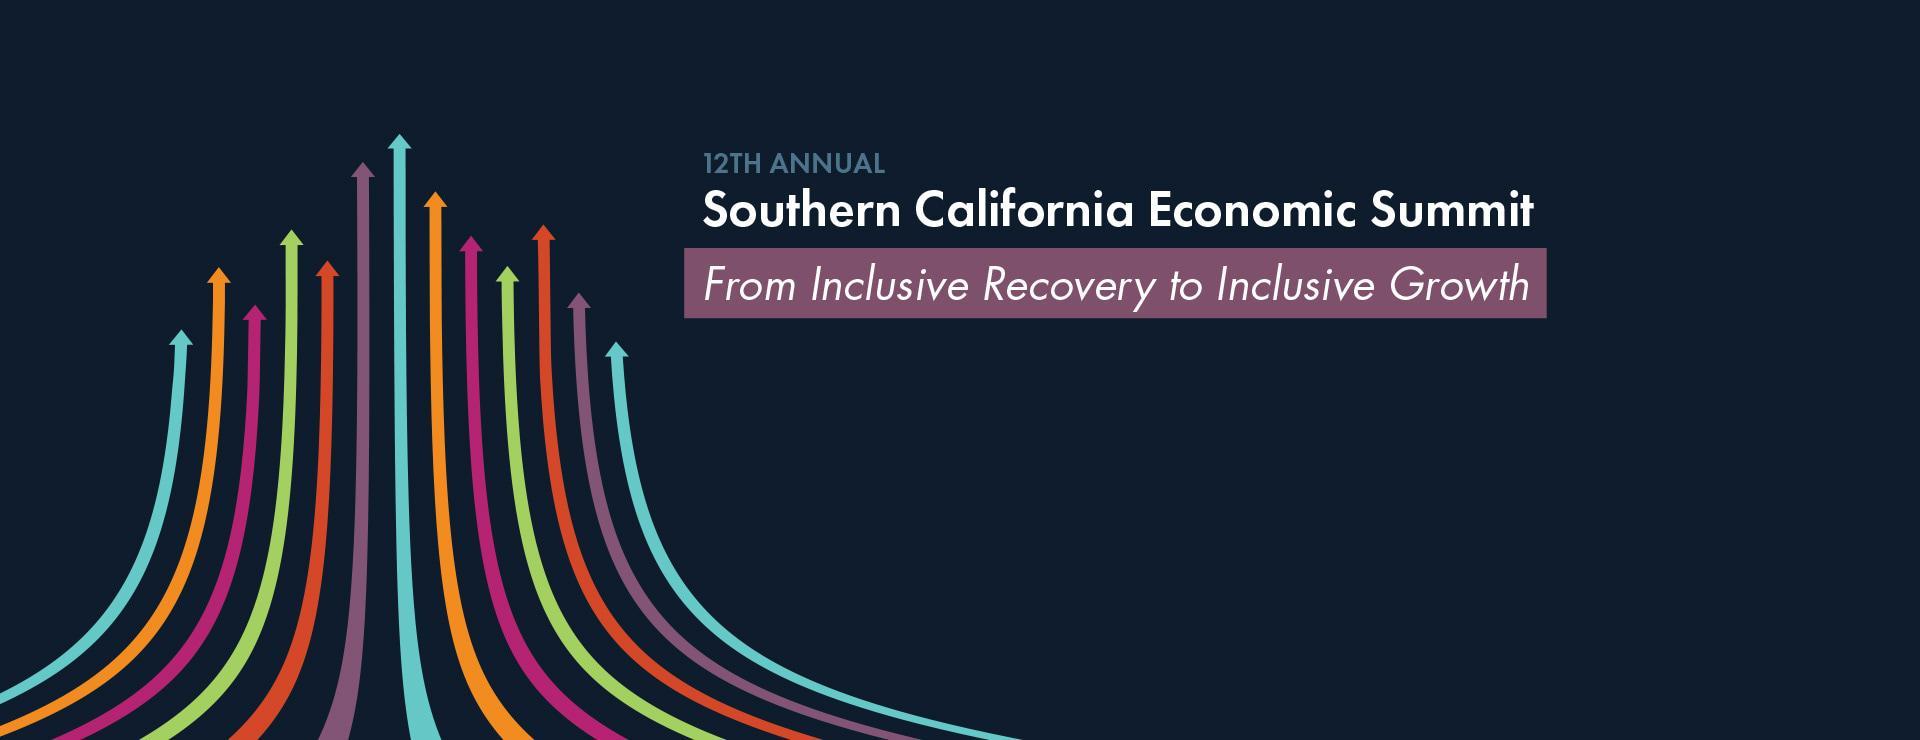 The 12th Annual Southern California Economic Summit